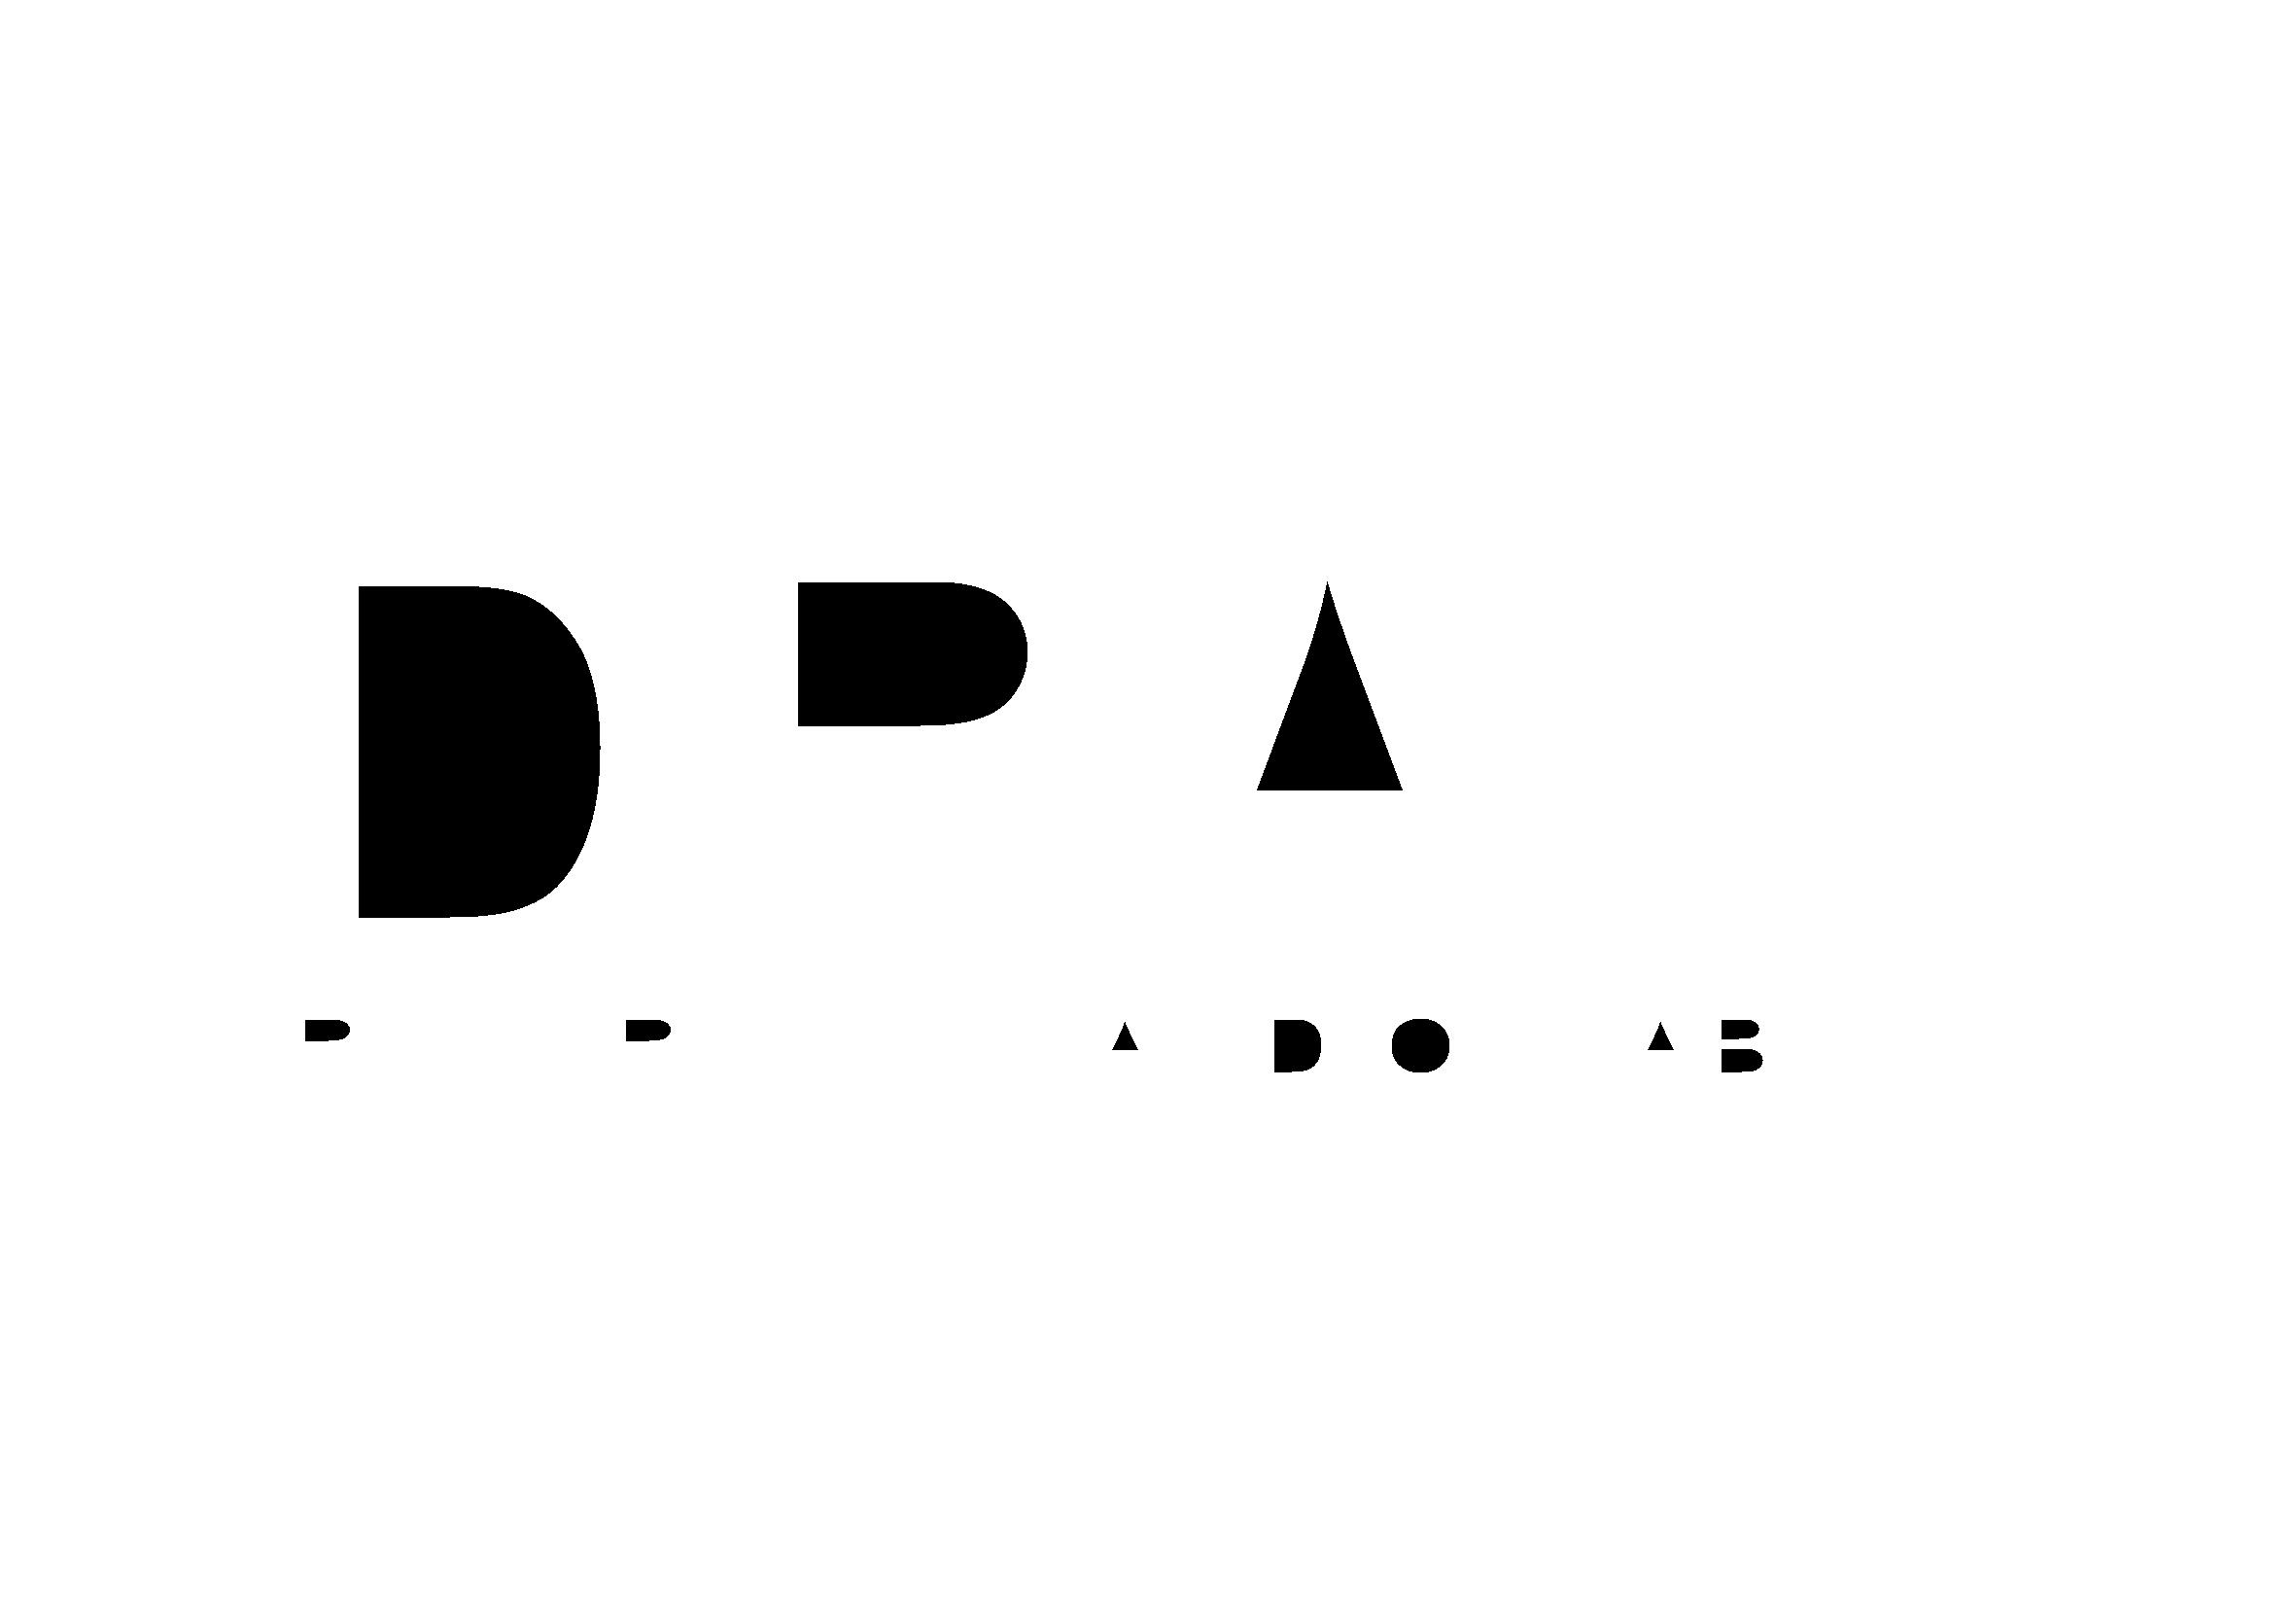 dram.png